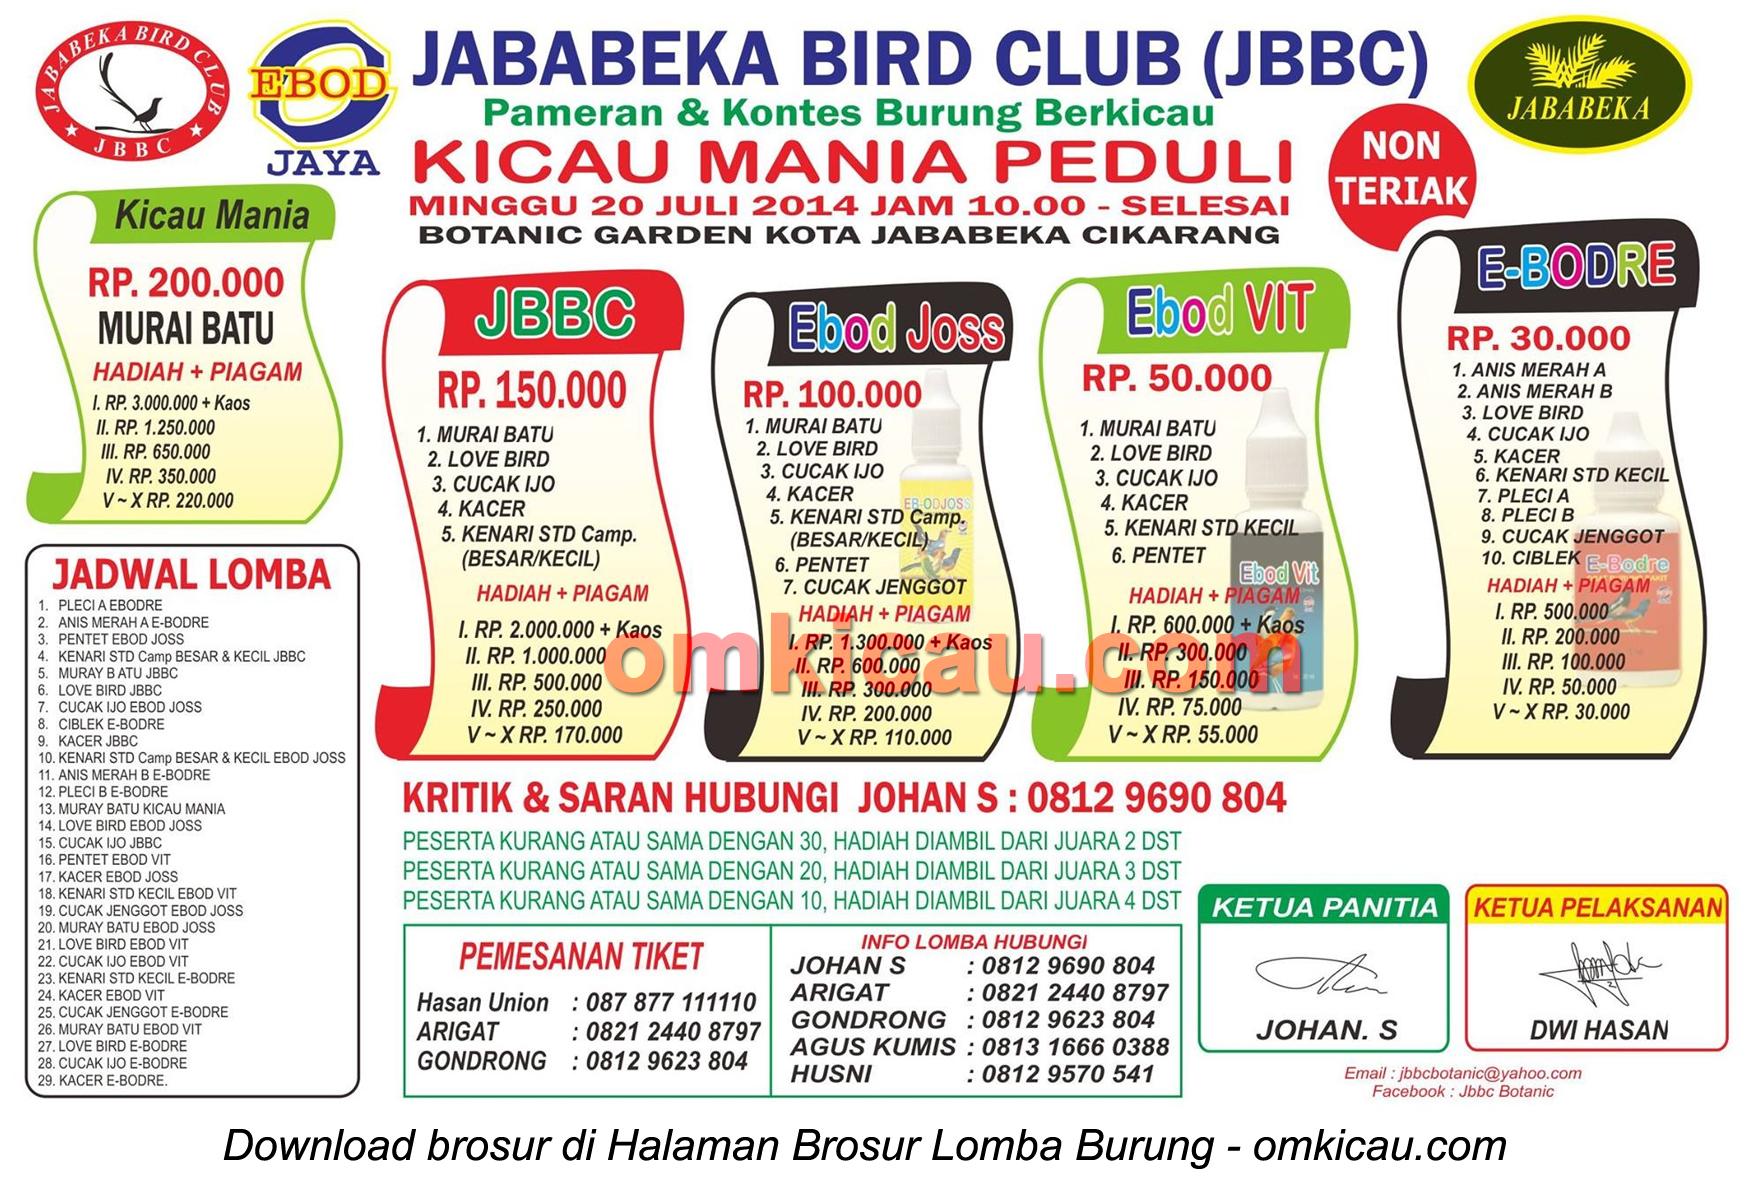 Brosur Lomba Burung Berkicau Kicaumania Peduli - Jababeka BC, Bekasi, 20 Juli 2014